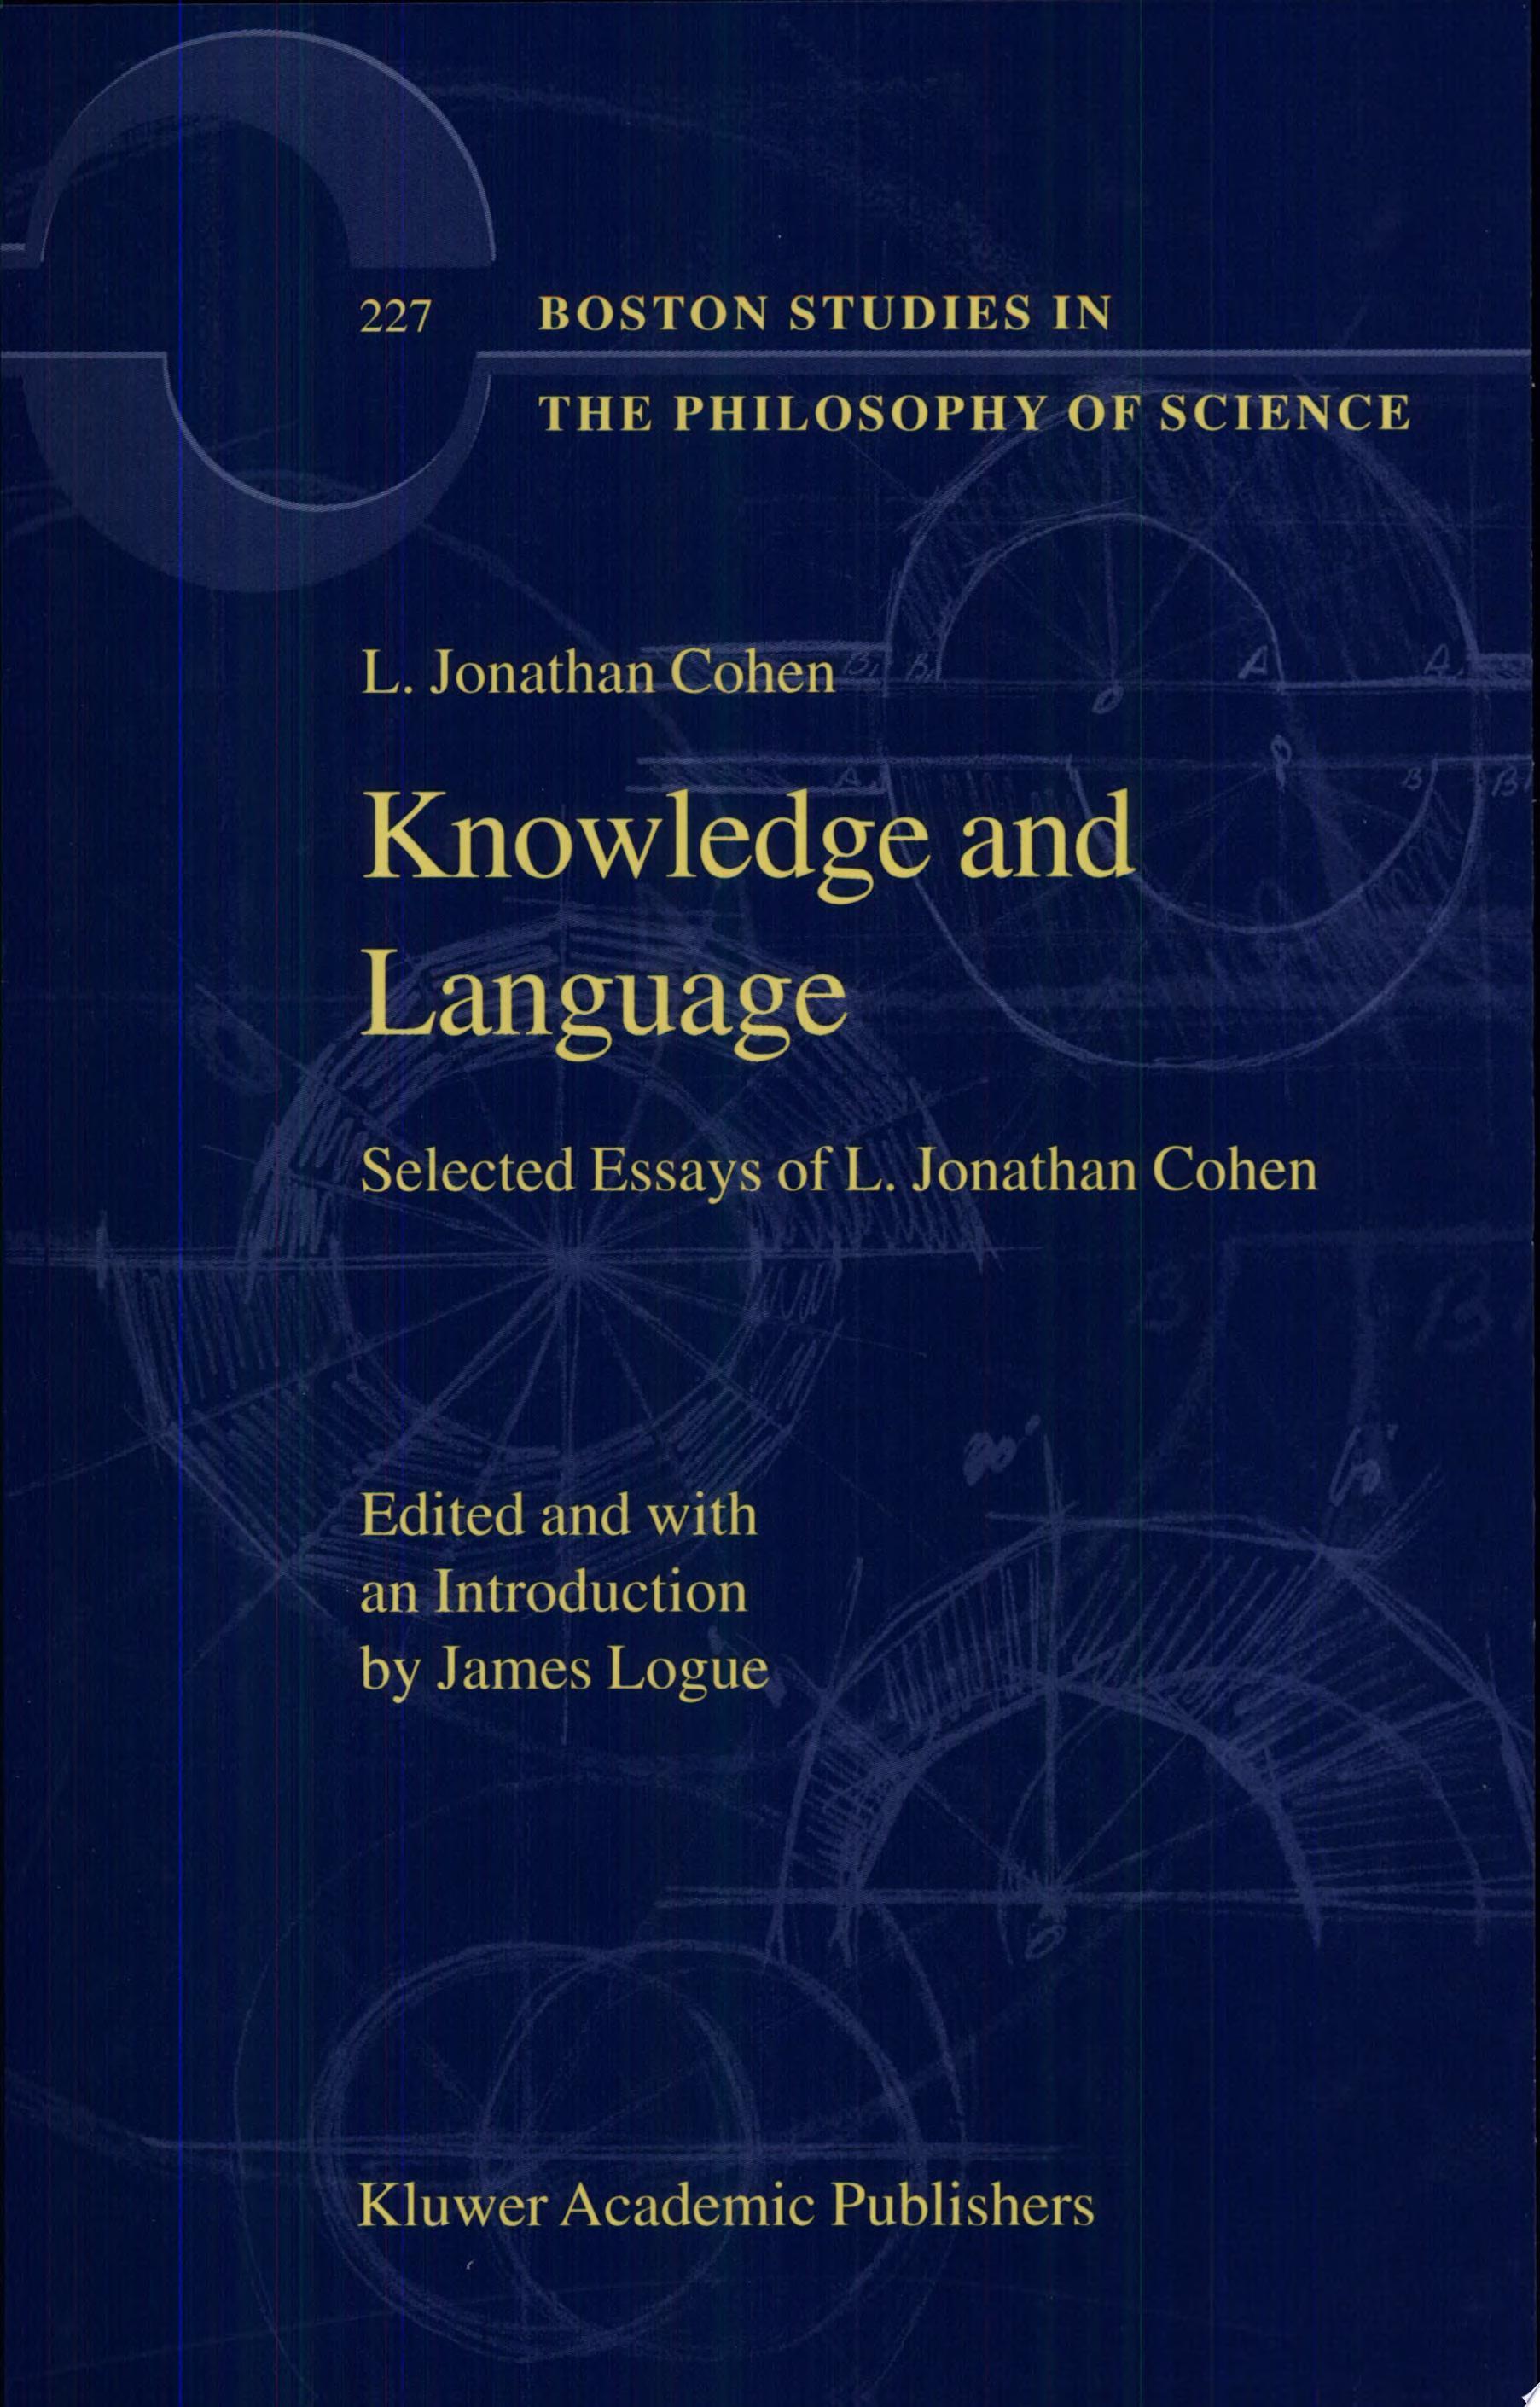 Knowledge and Language